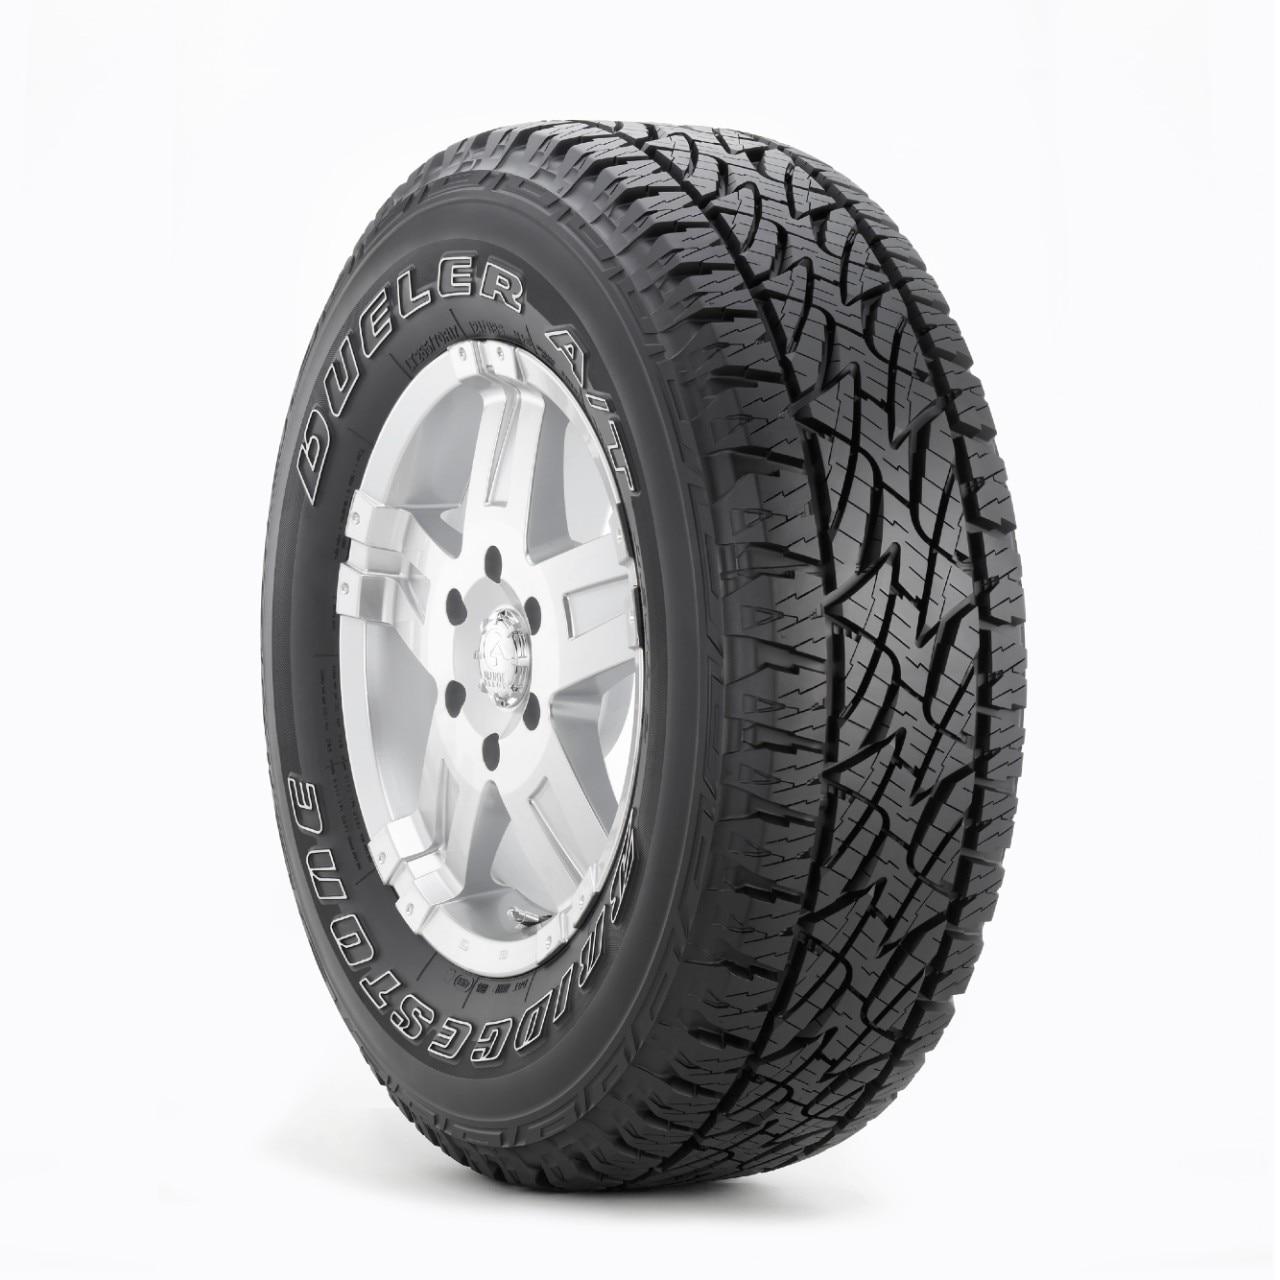 Dueler At Revo 2 Eco All Season Truck Tire Comfortable